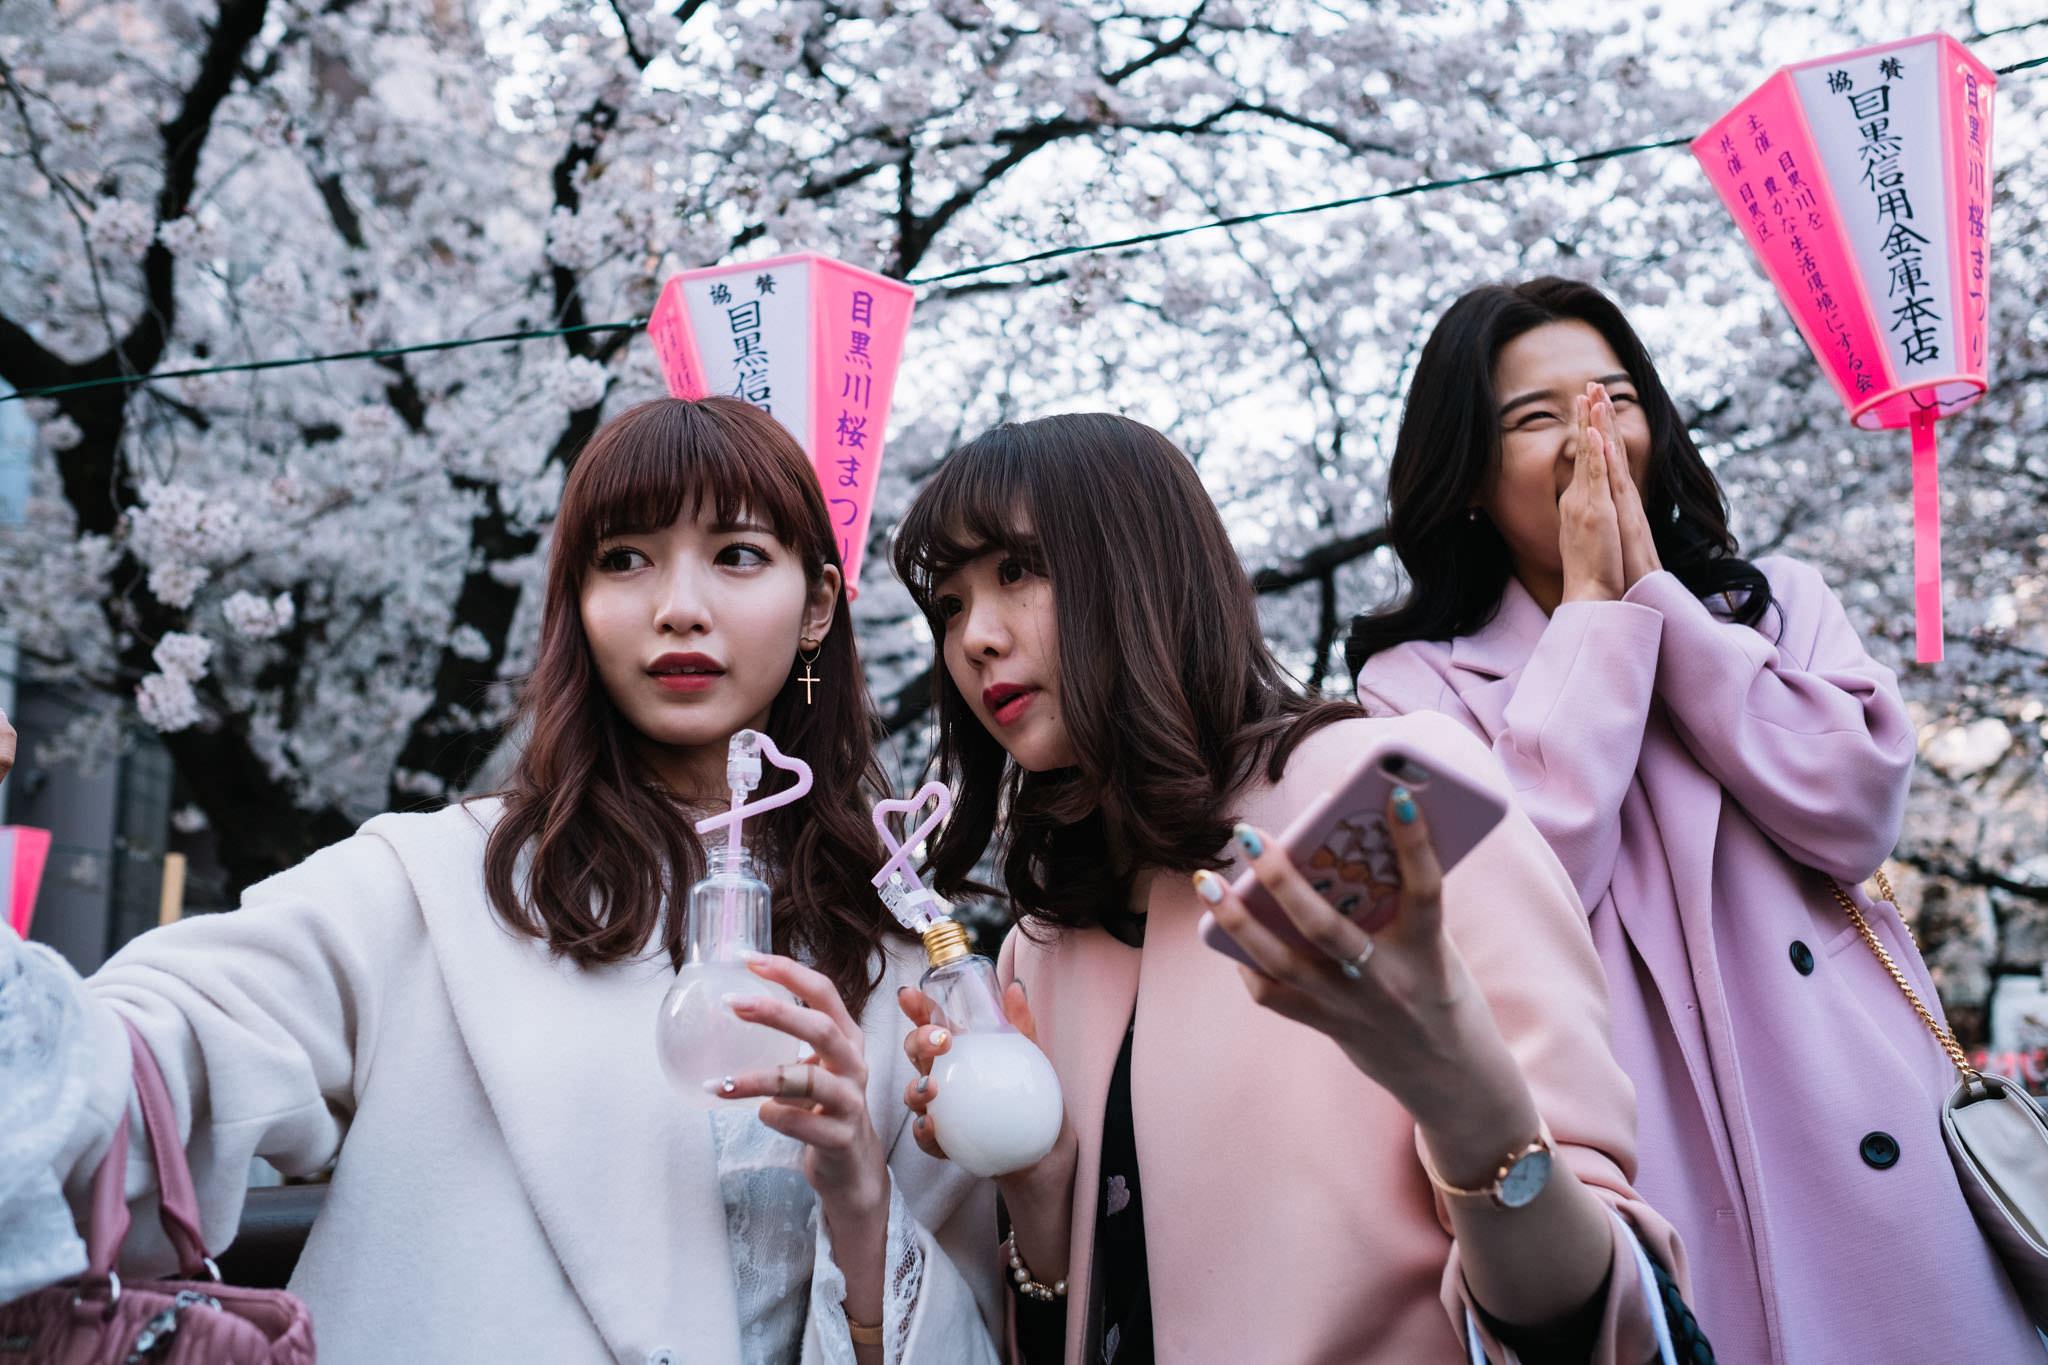 chris_eberhardt_japan_travel_reise_nippon-26.jpg